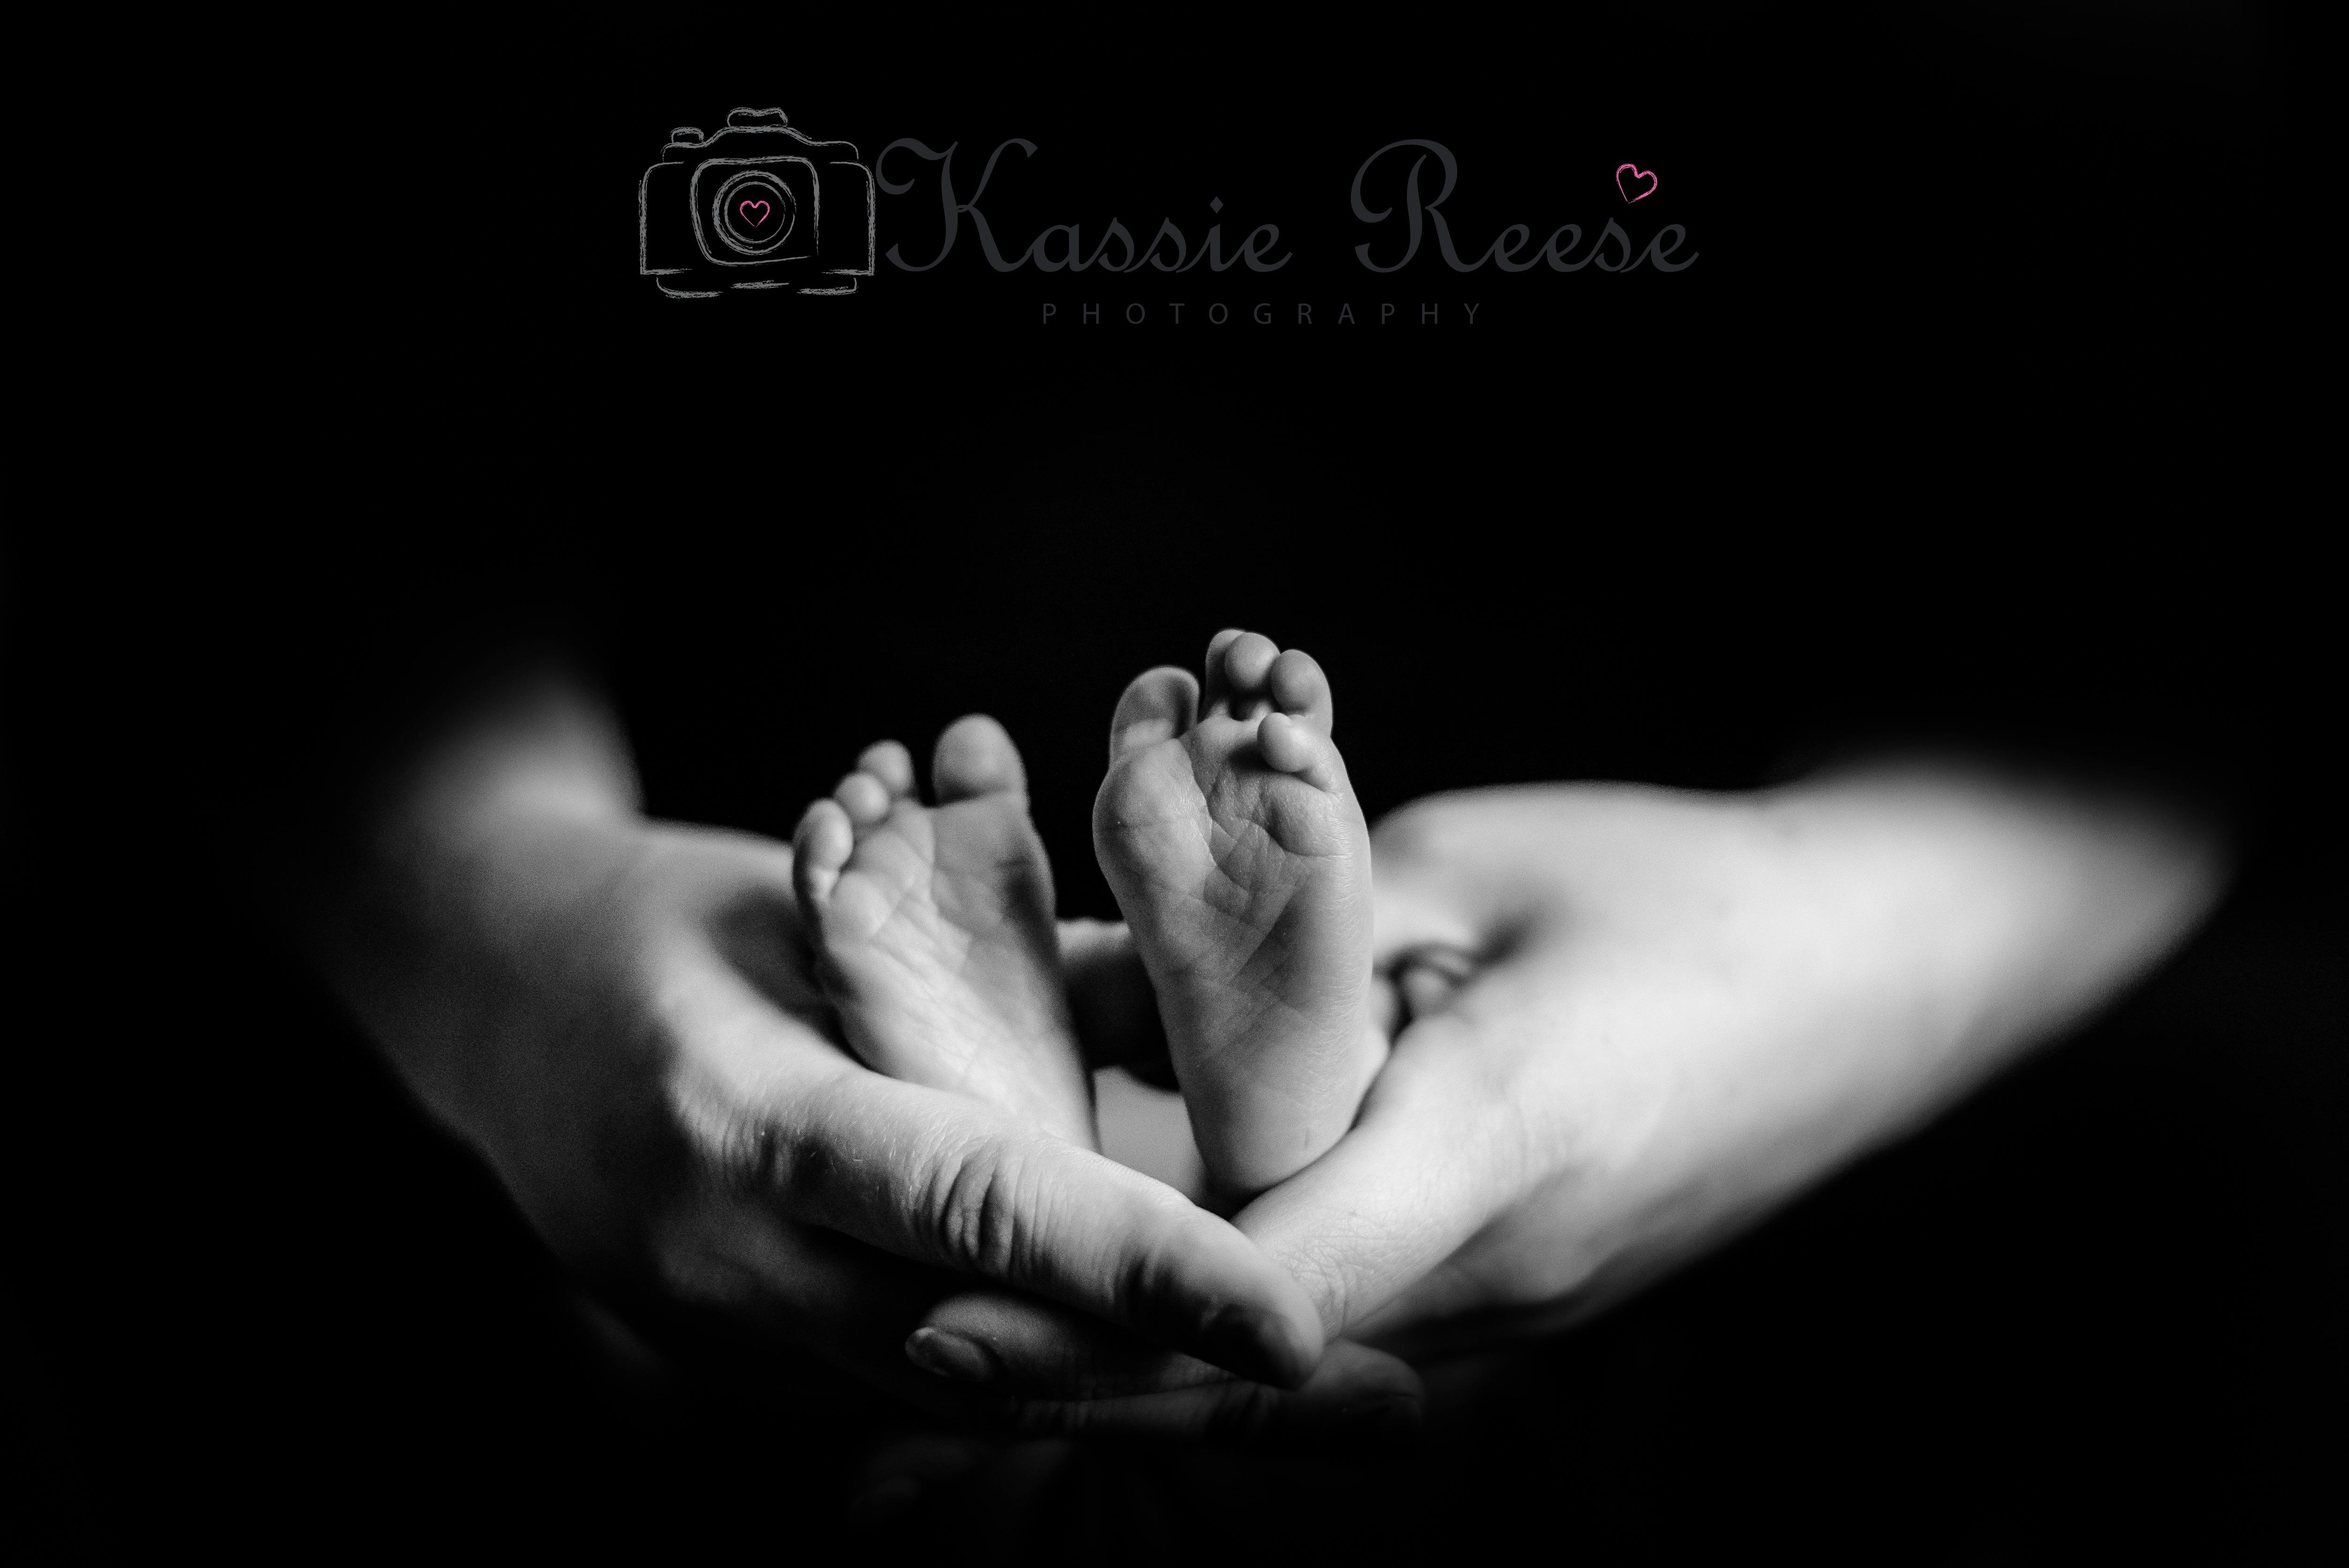 Kassiereesephotography-6l